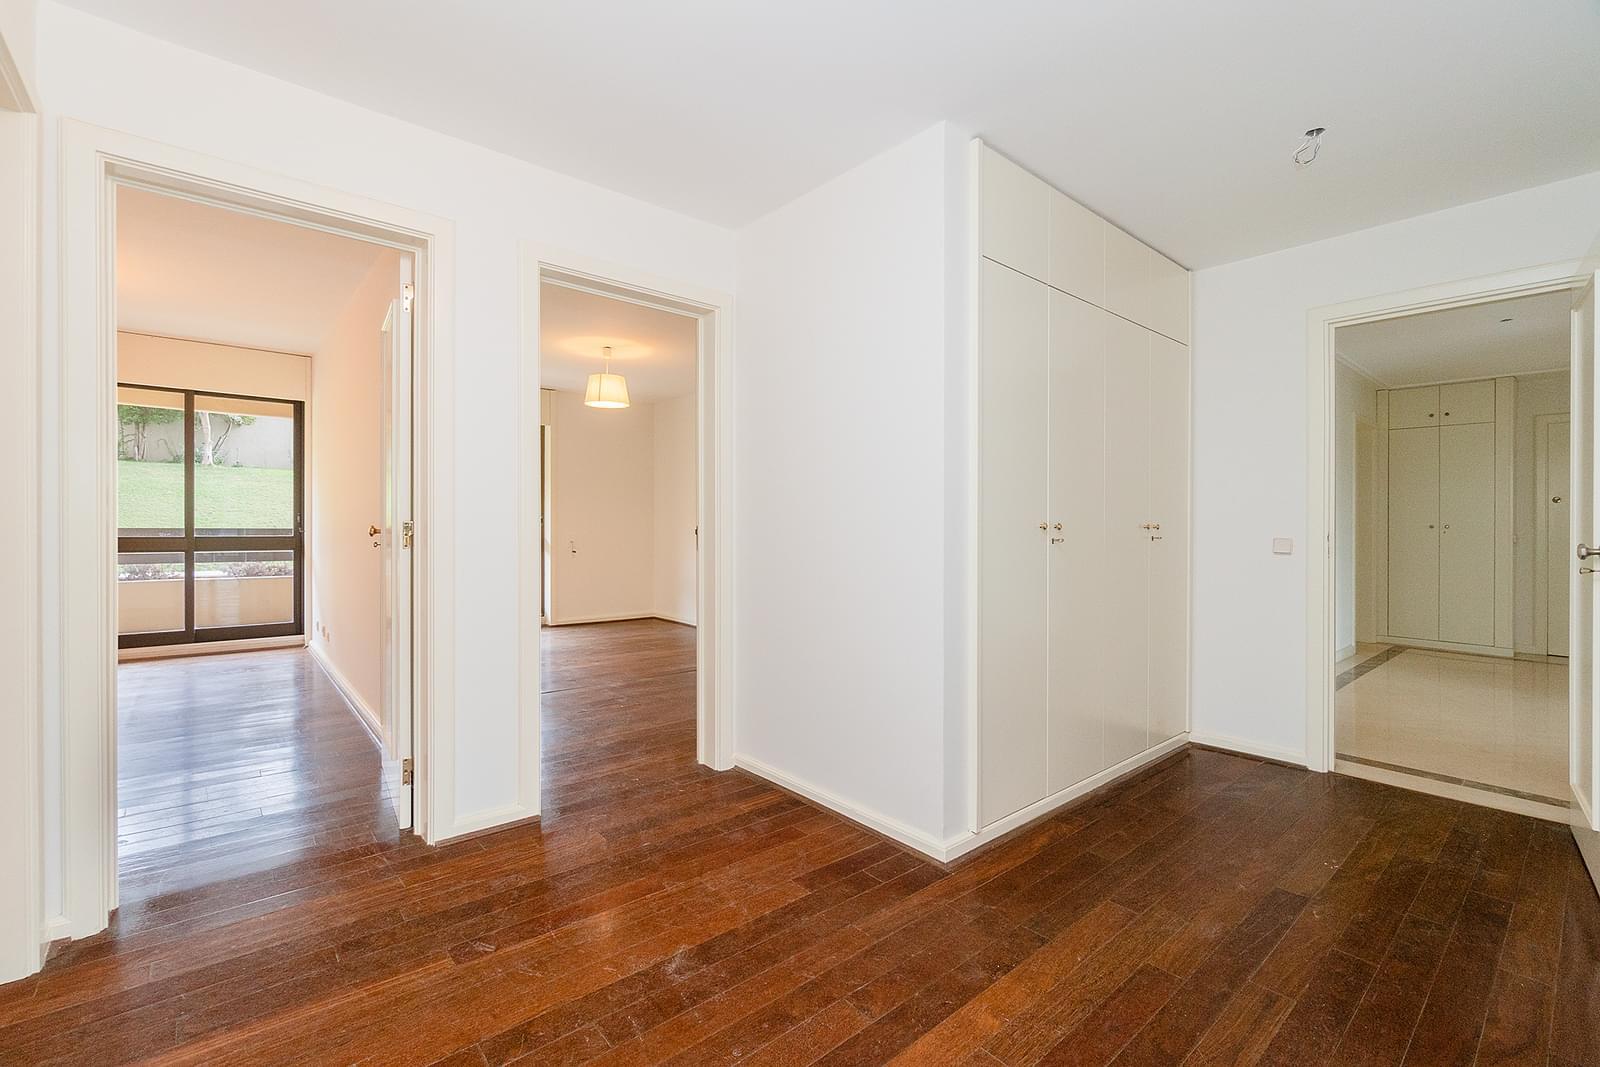 pf18551-apartamento-t3-1-lisboa-0fc8fe3b-51ef-42e2-bf87-da68a530663e